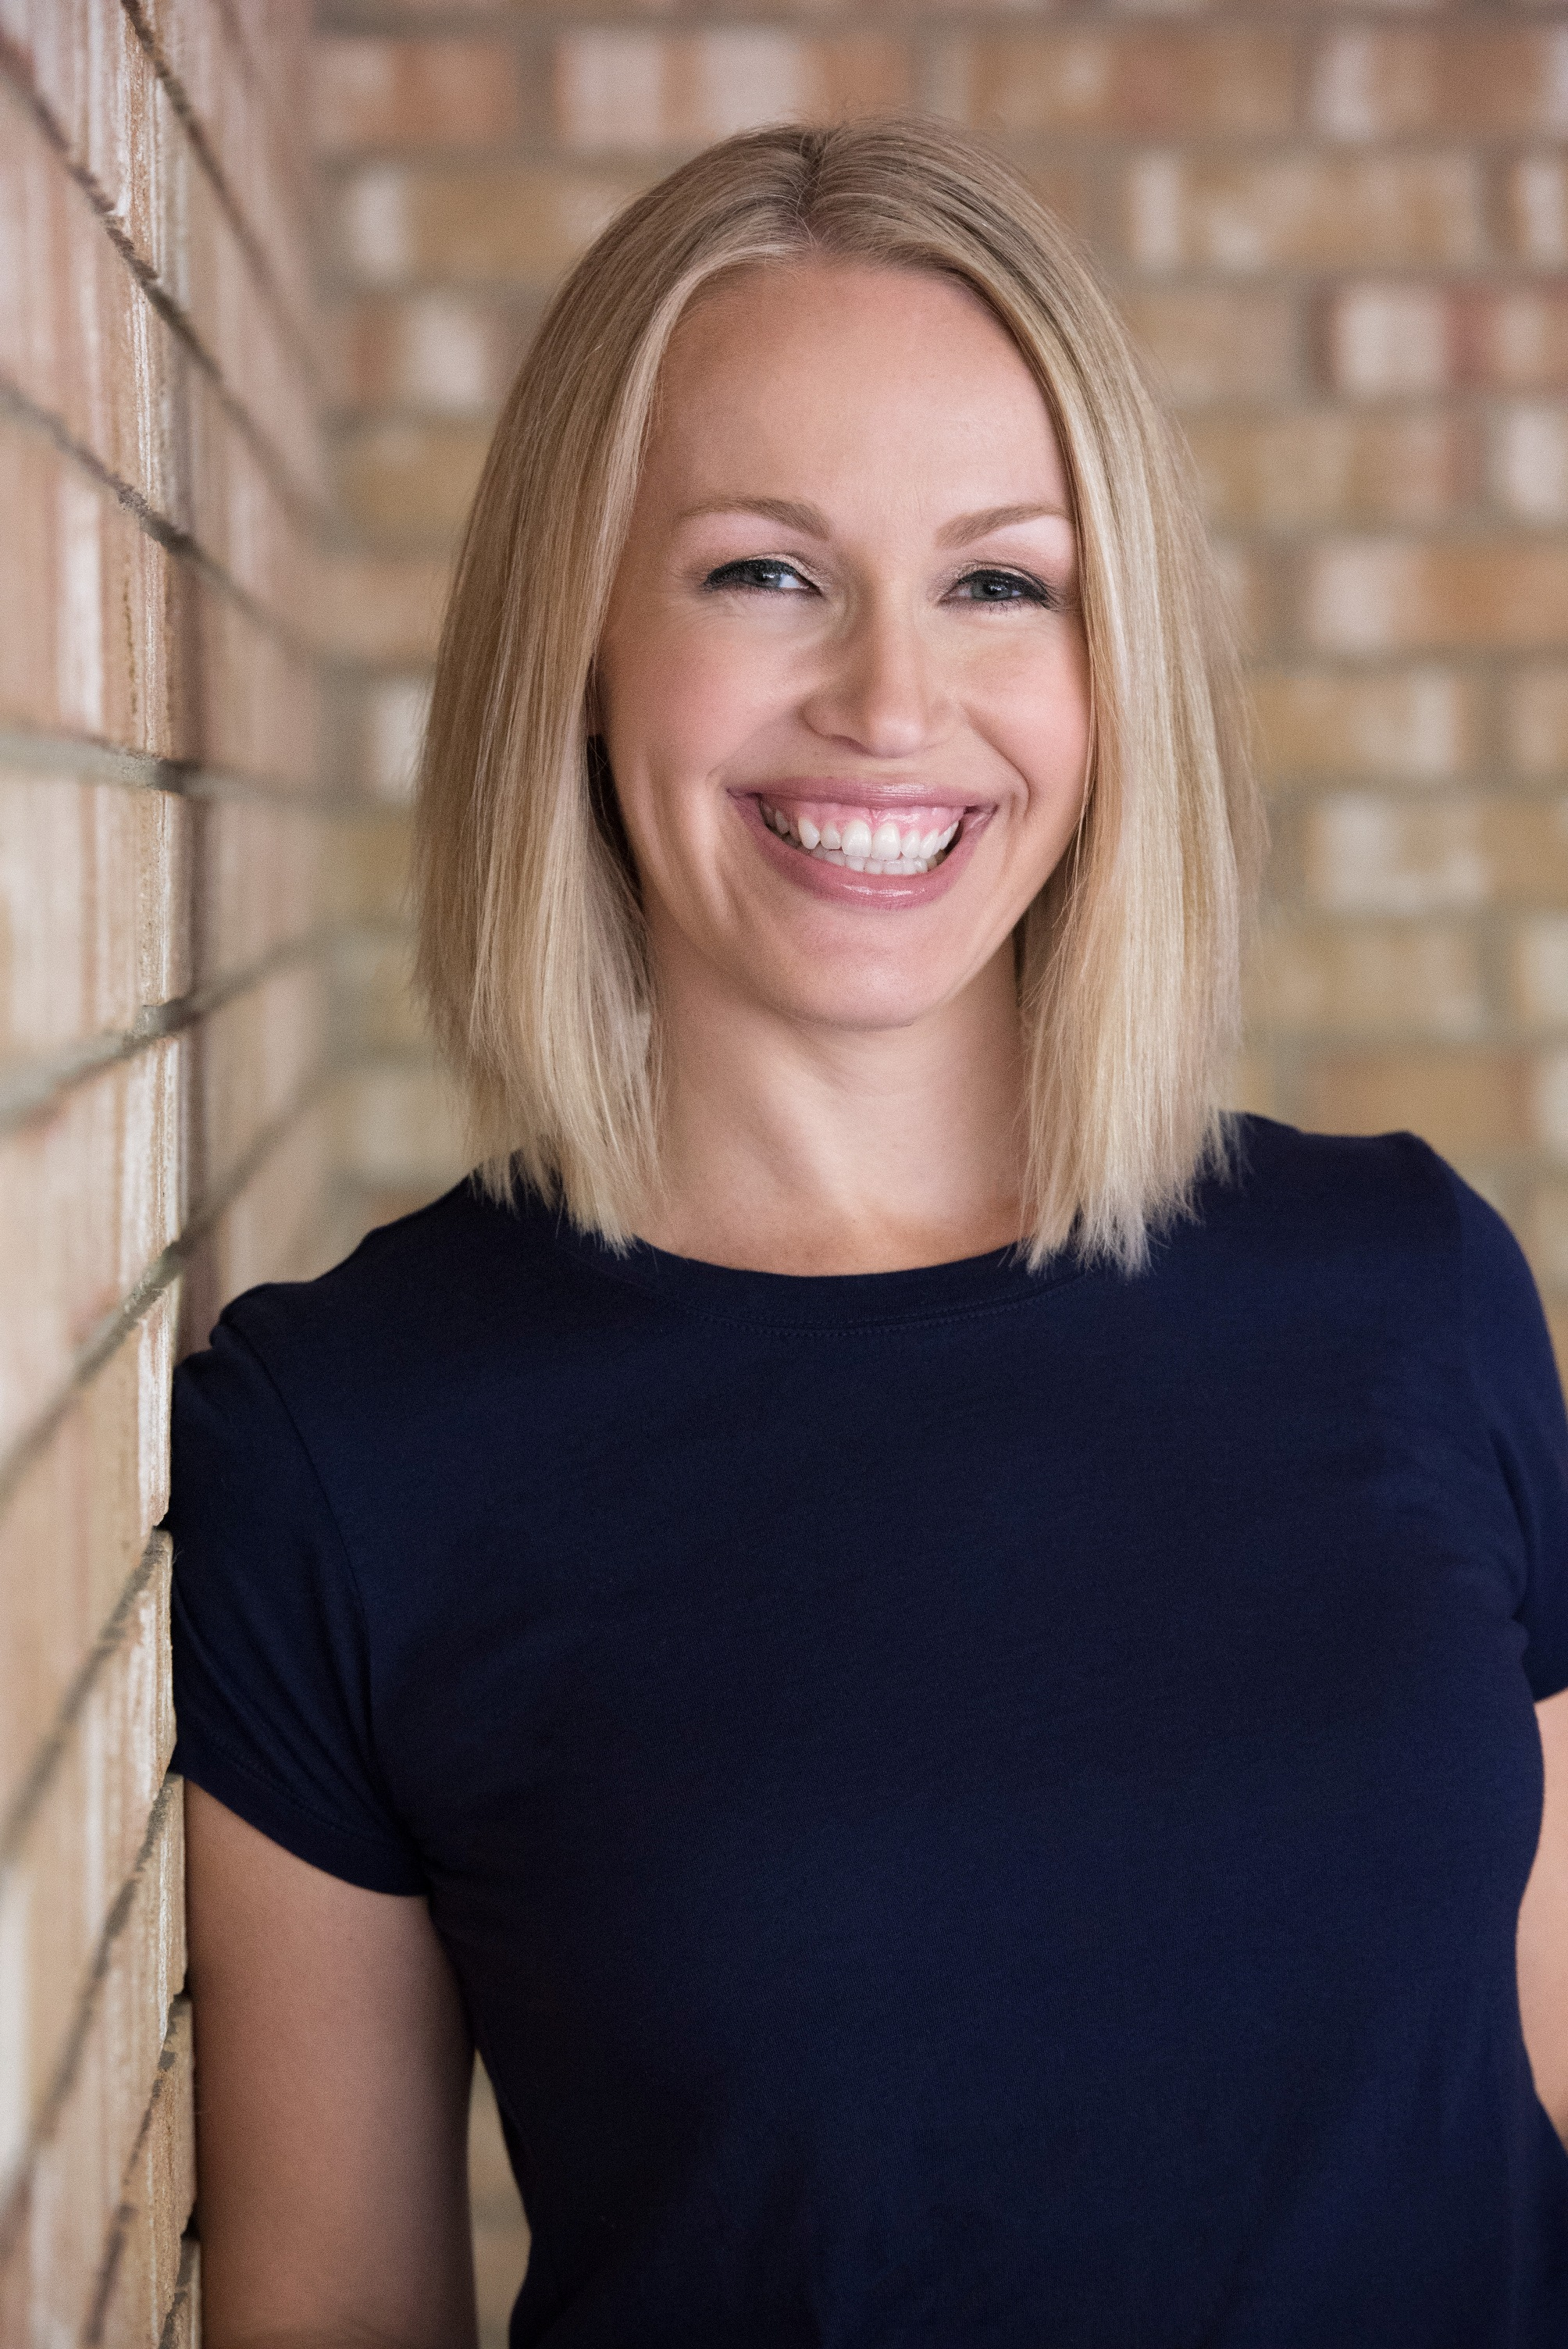 Elise Bowerman